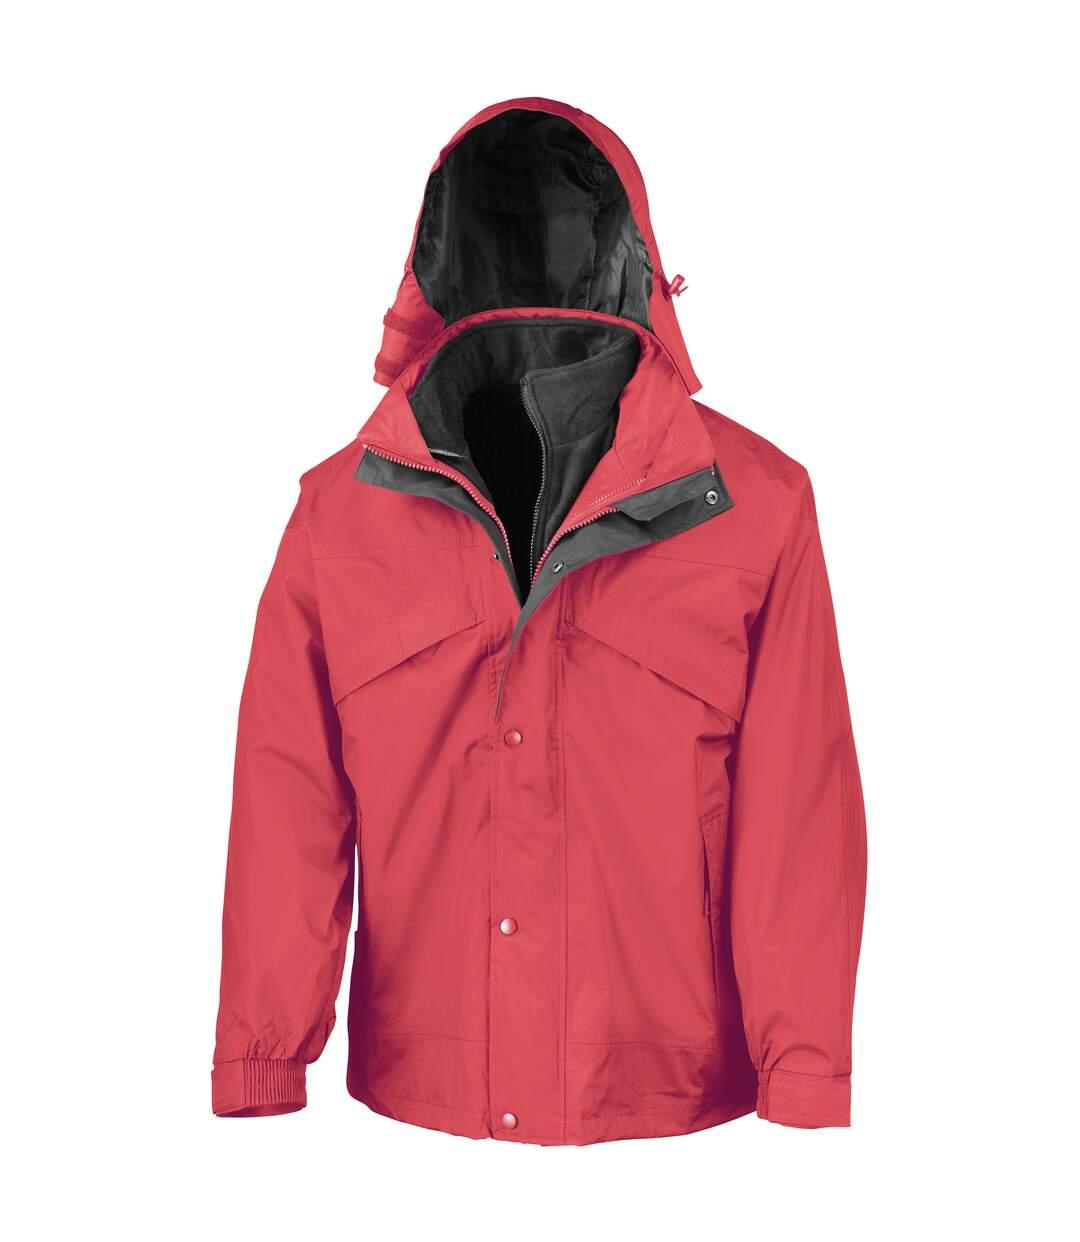 Result Mens 3 In 1 Zip And Clip StormDri Waterproof Windproof Jacket (Red) - UTBC930